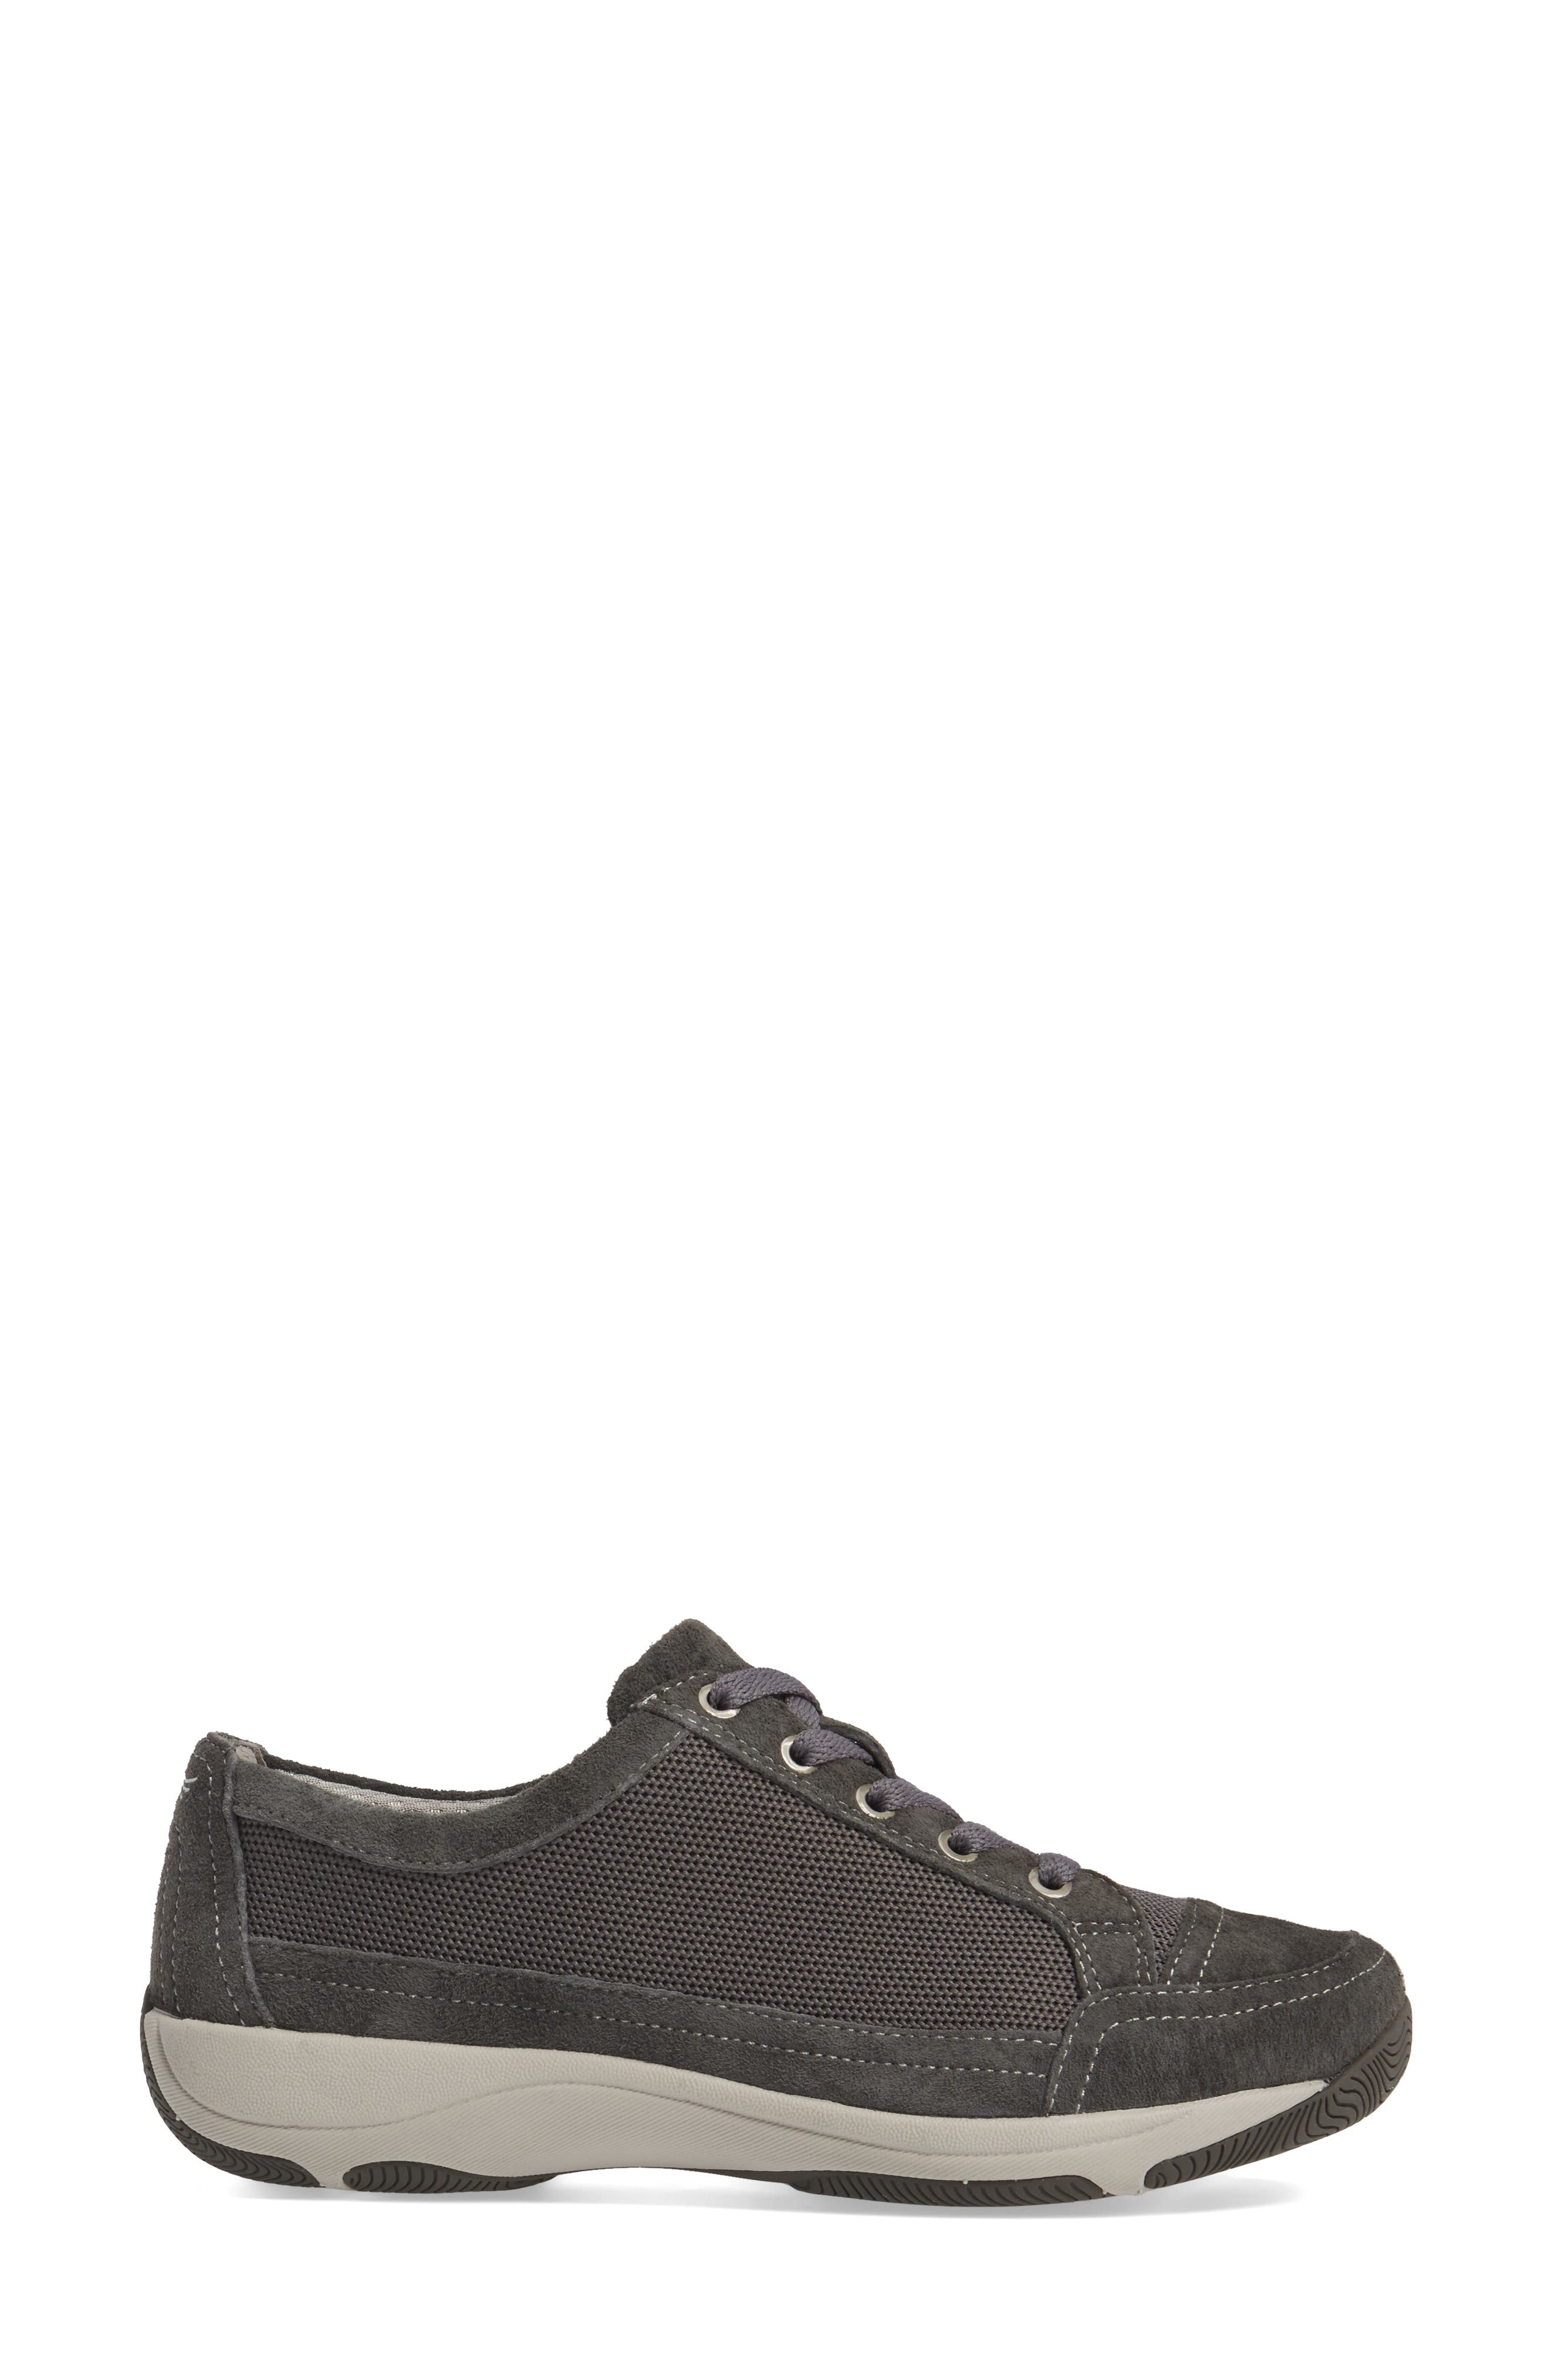 Harmony Sneaker,                             Alternate thumbnail 8, color,